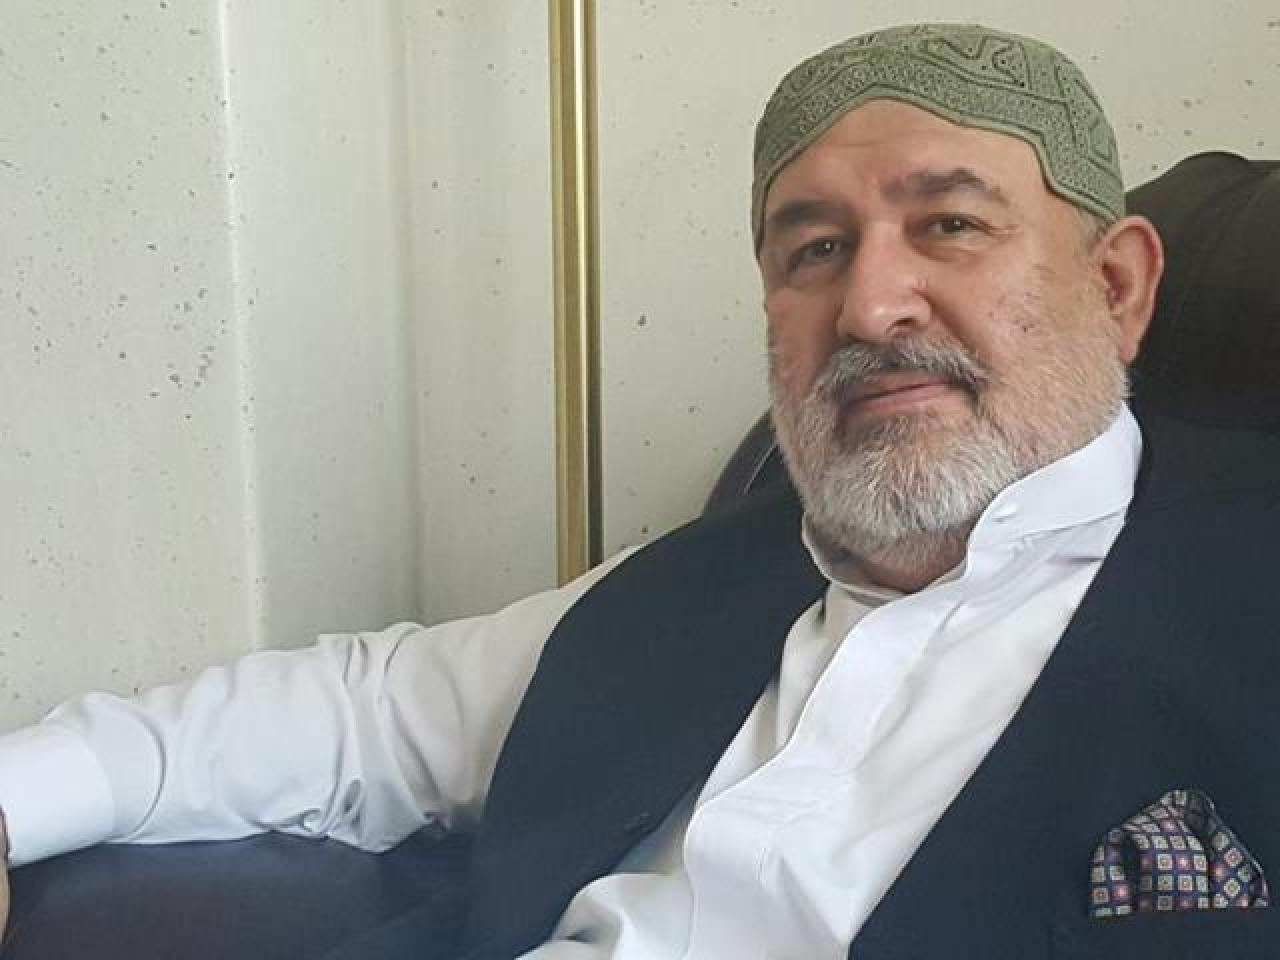 baloch leader seeks india - HD1280×960